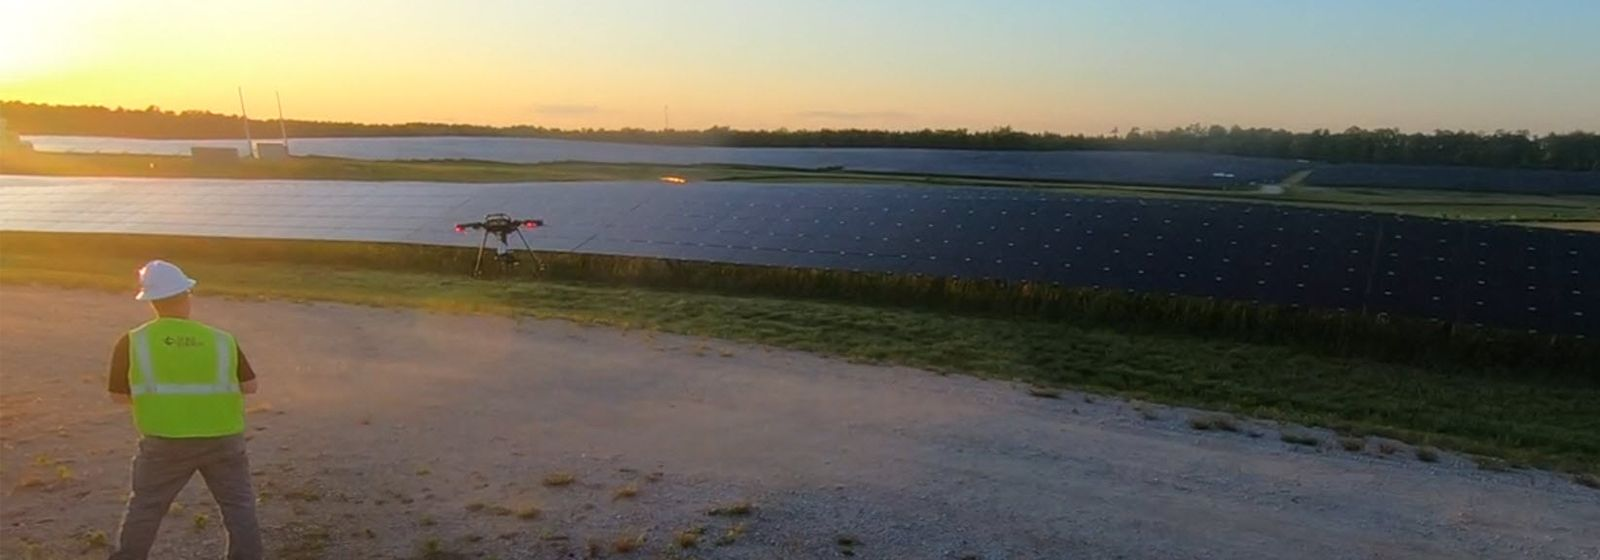 5 ways Duke Energy is using drone technology